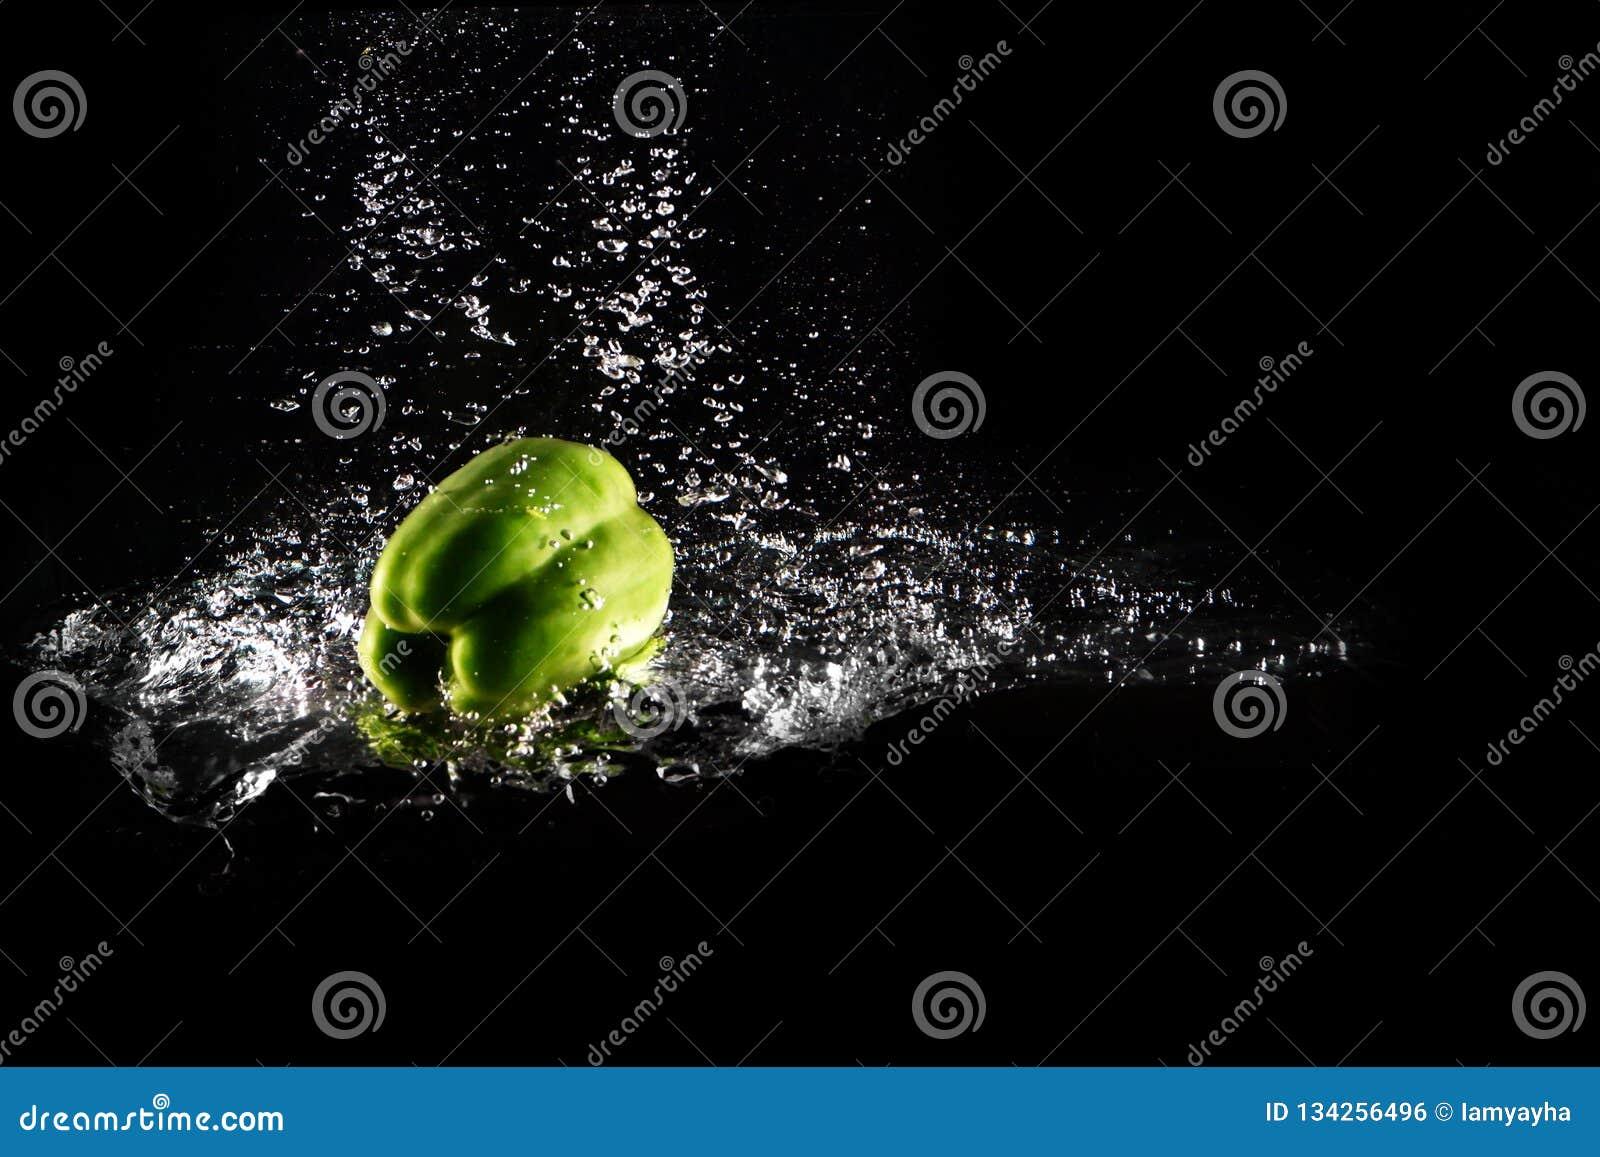 Verse Groene Groene paprika met Waterplons en Geïsoleerde Bel De Ruimte van het peperexemplaar Sappige Groene Paprika Dropped Fal